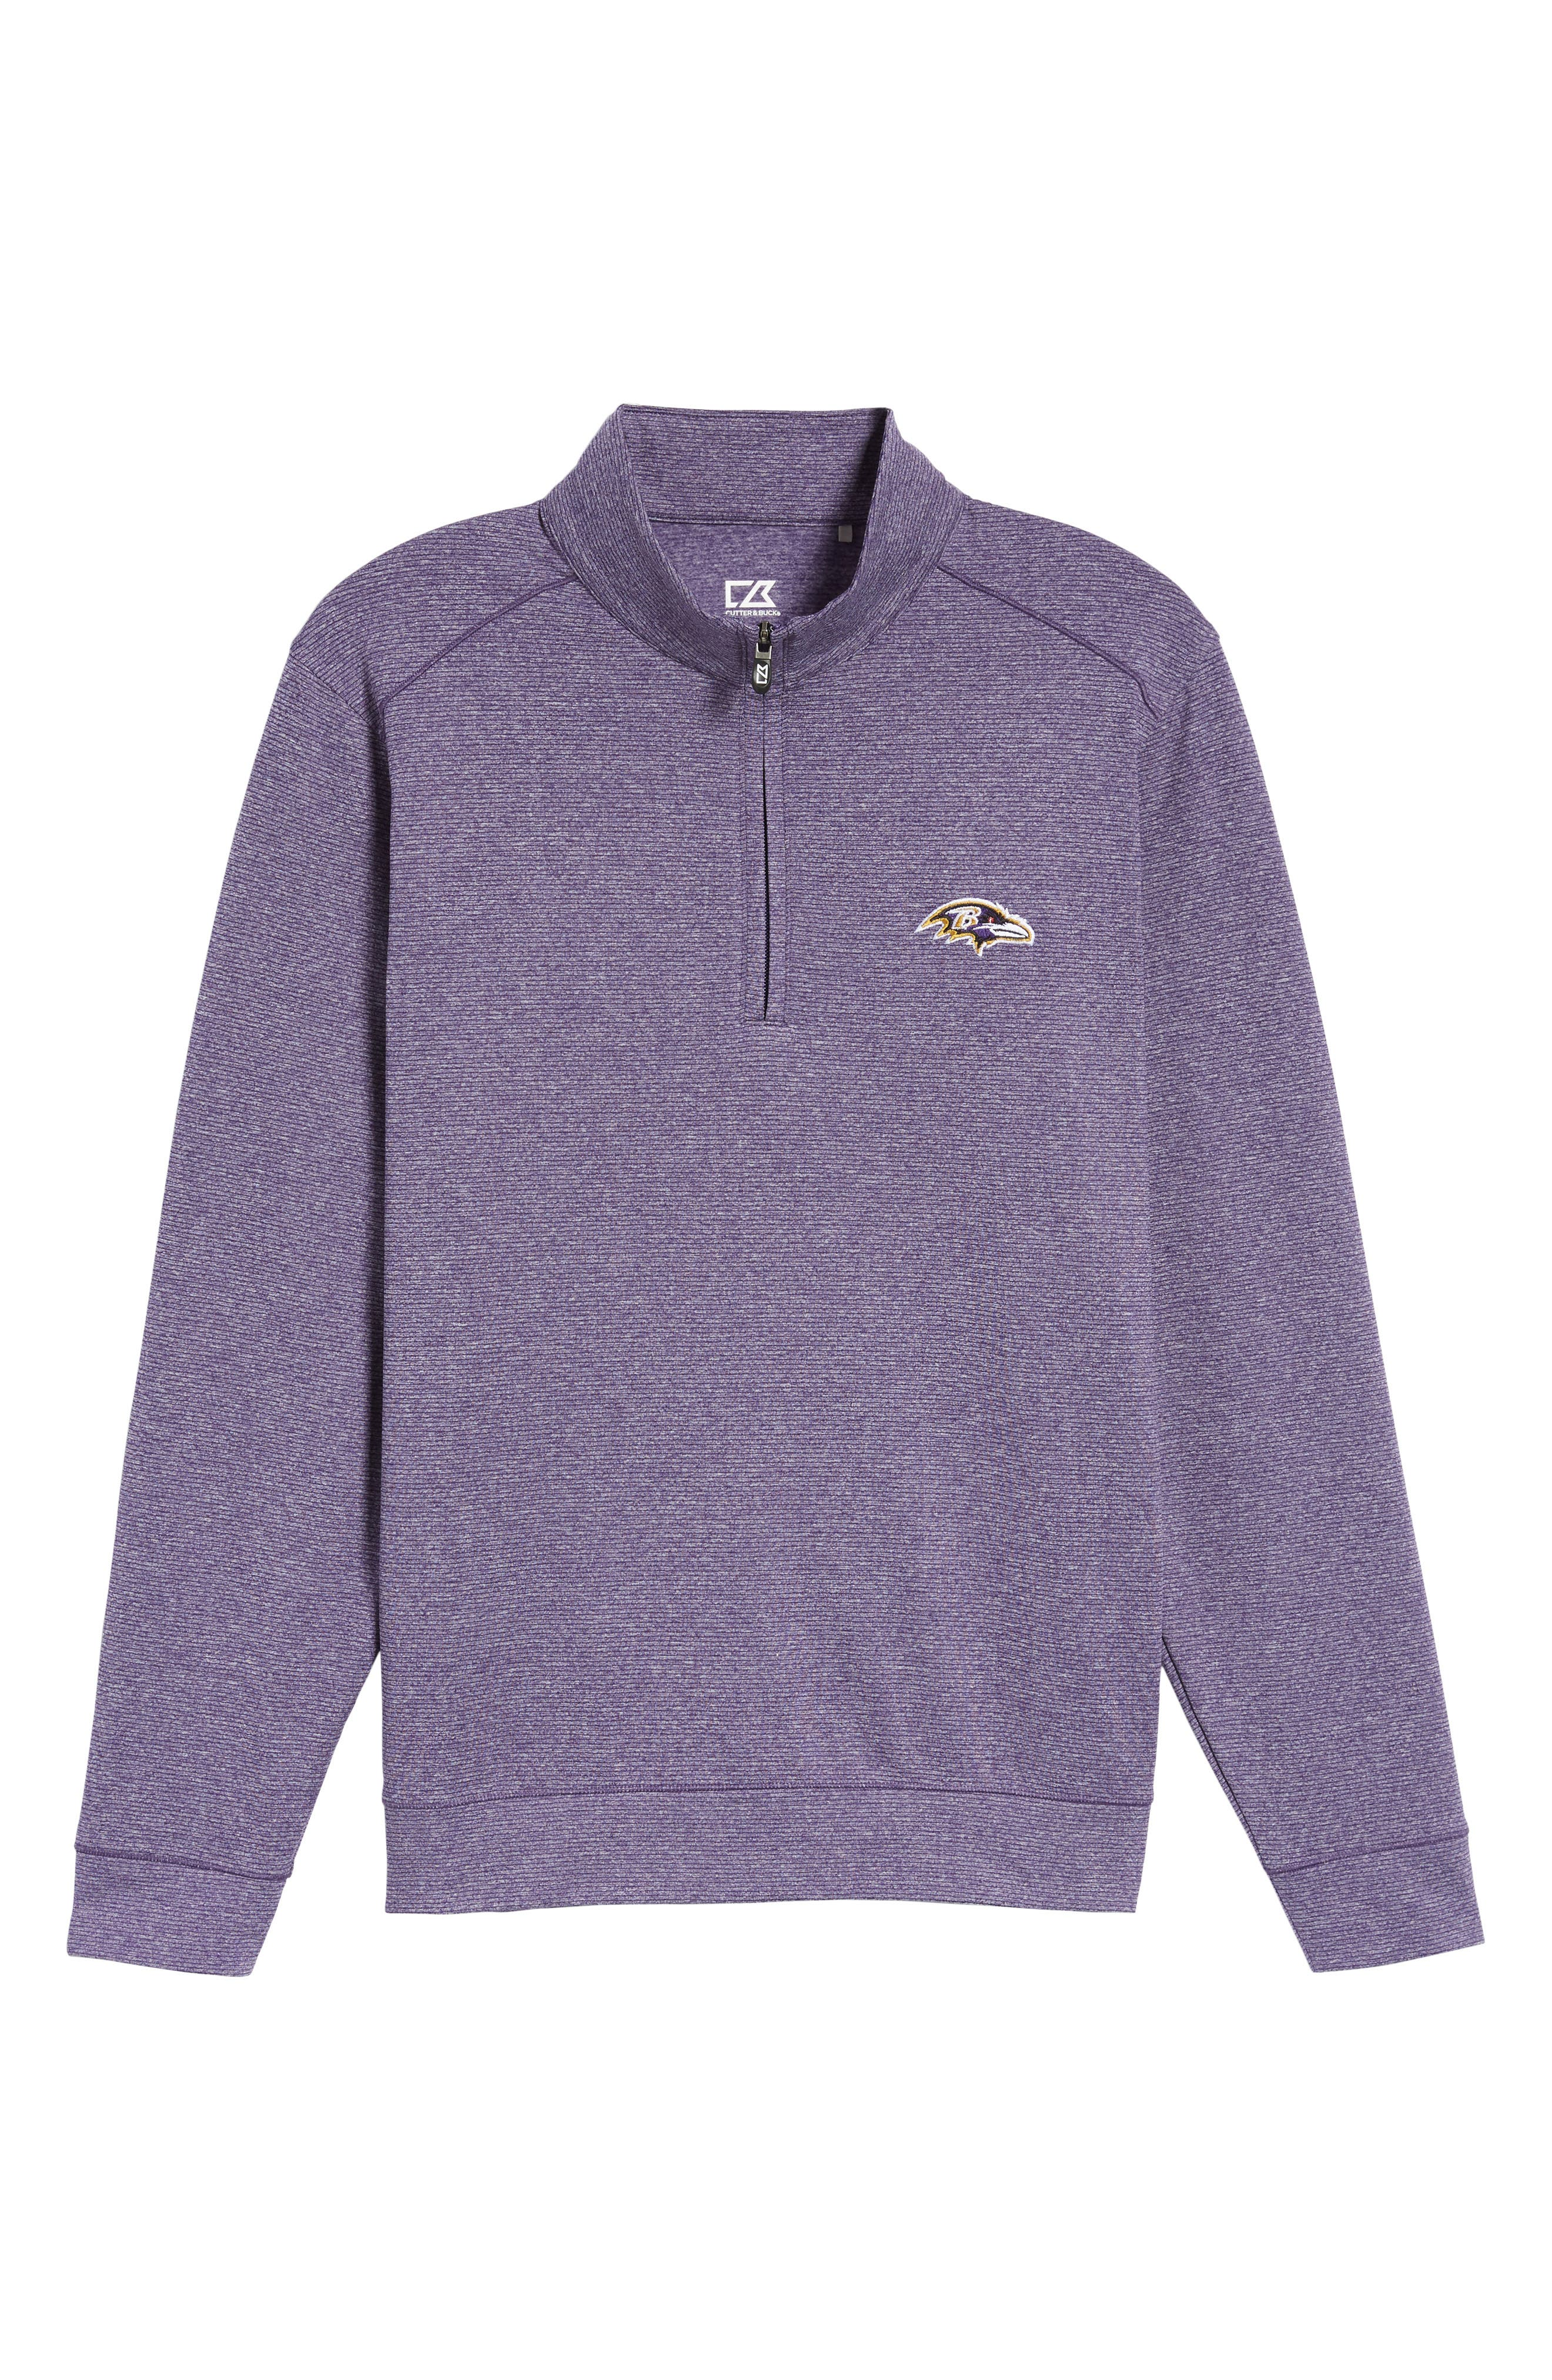 Shoreline - Baltimore Ravens Half Zip Pullover,                             Alternate thumbnail 6, color,                             College Purple Heather